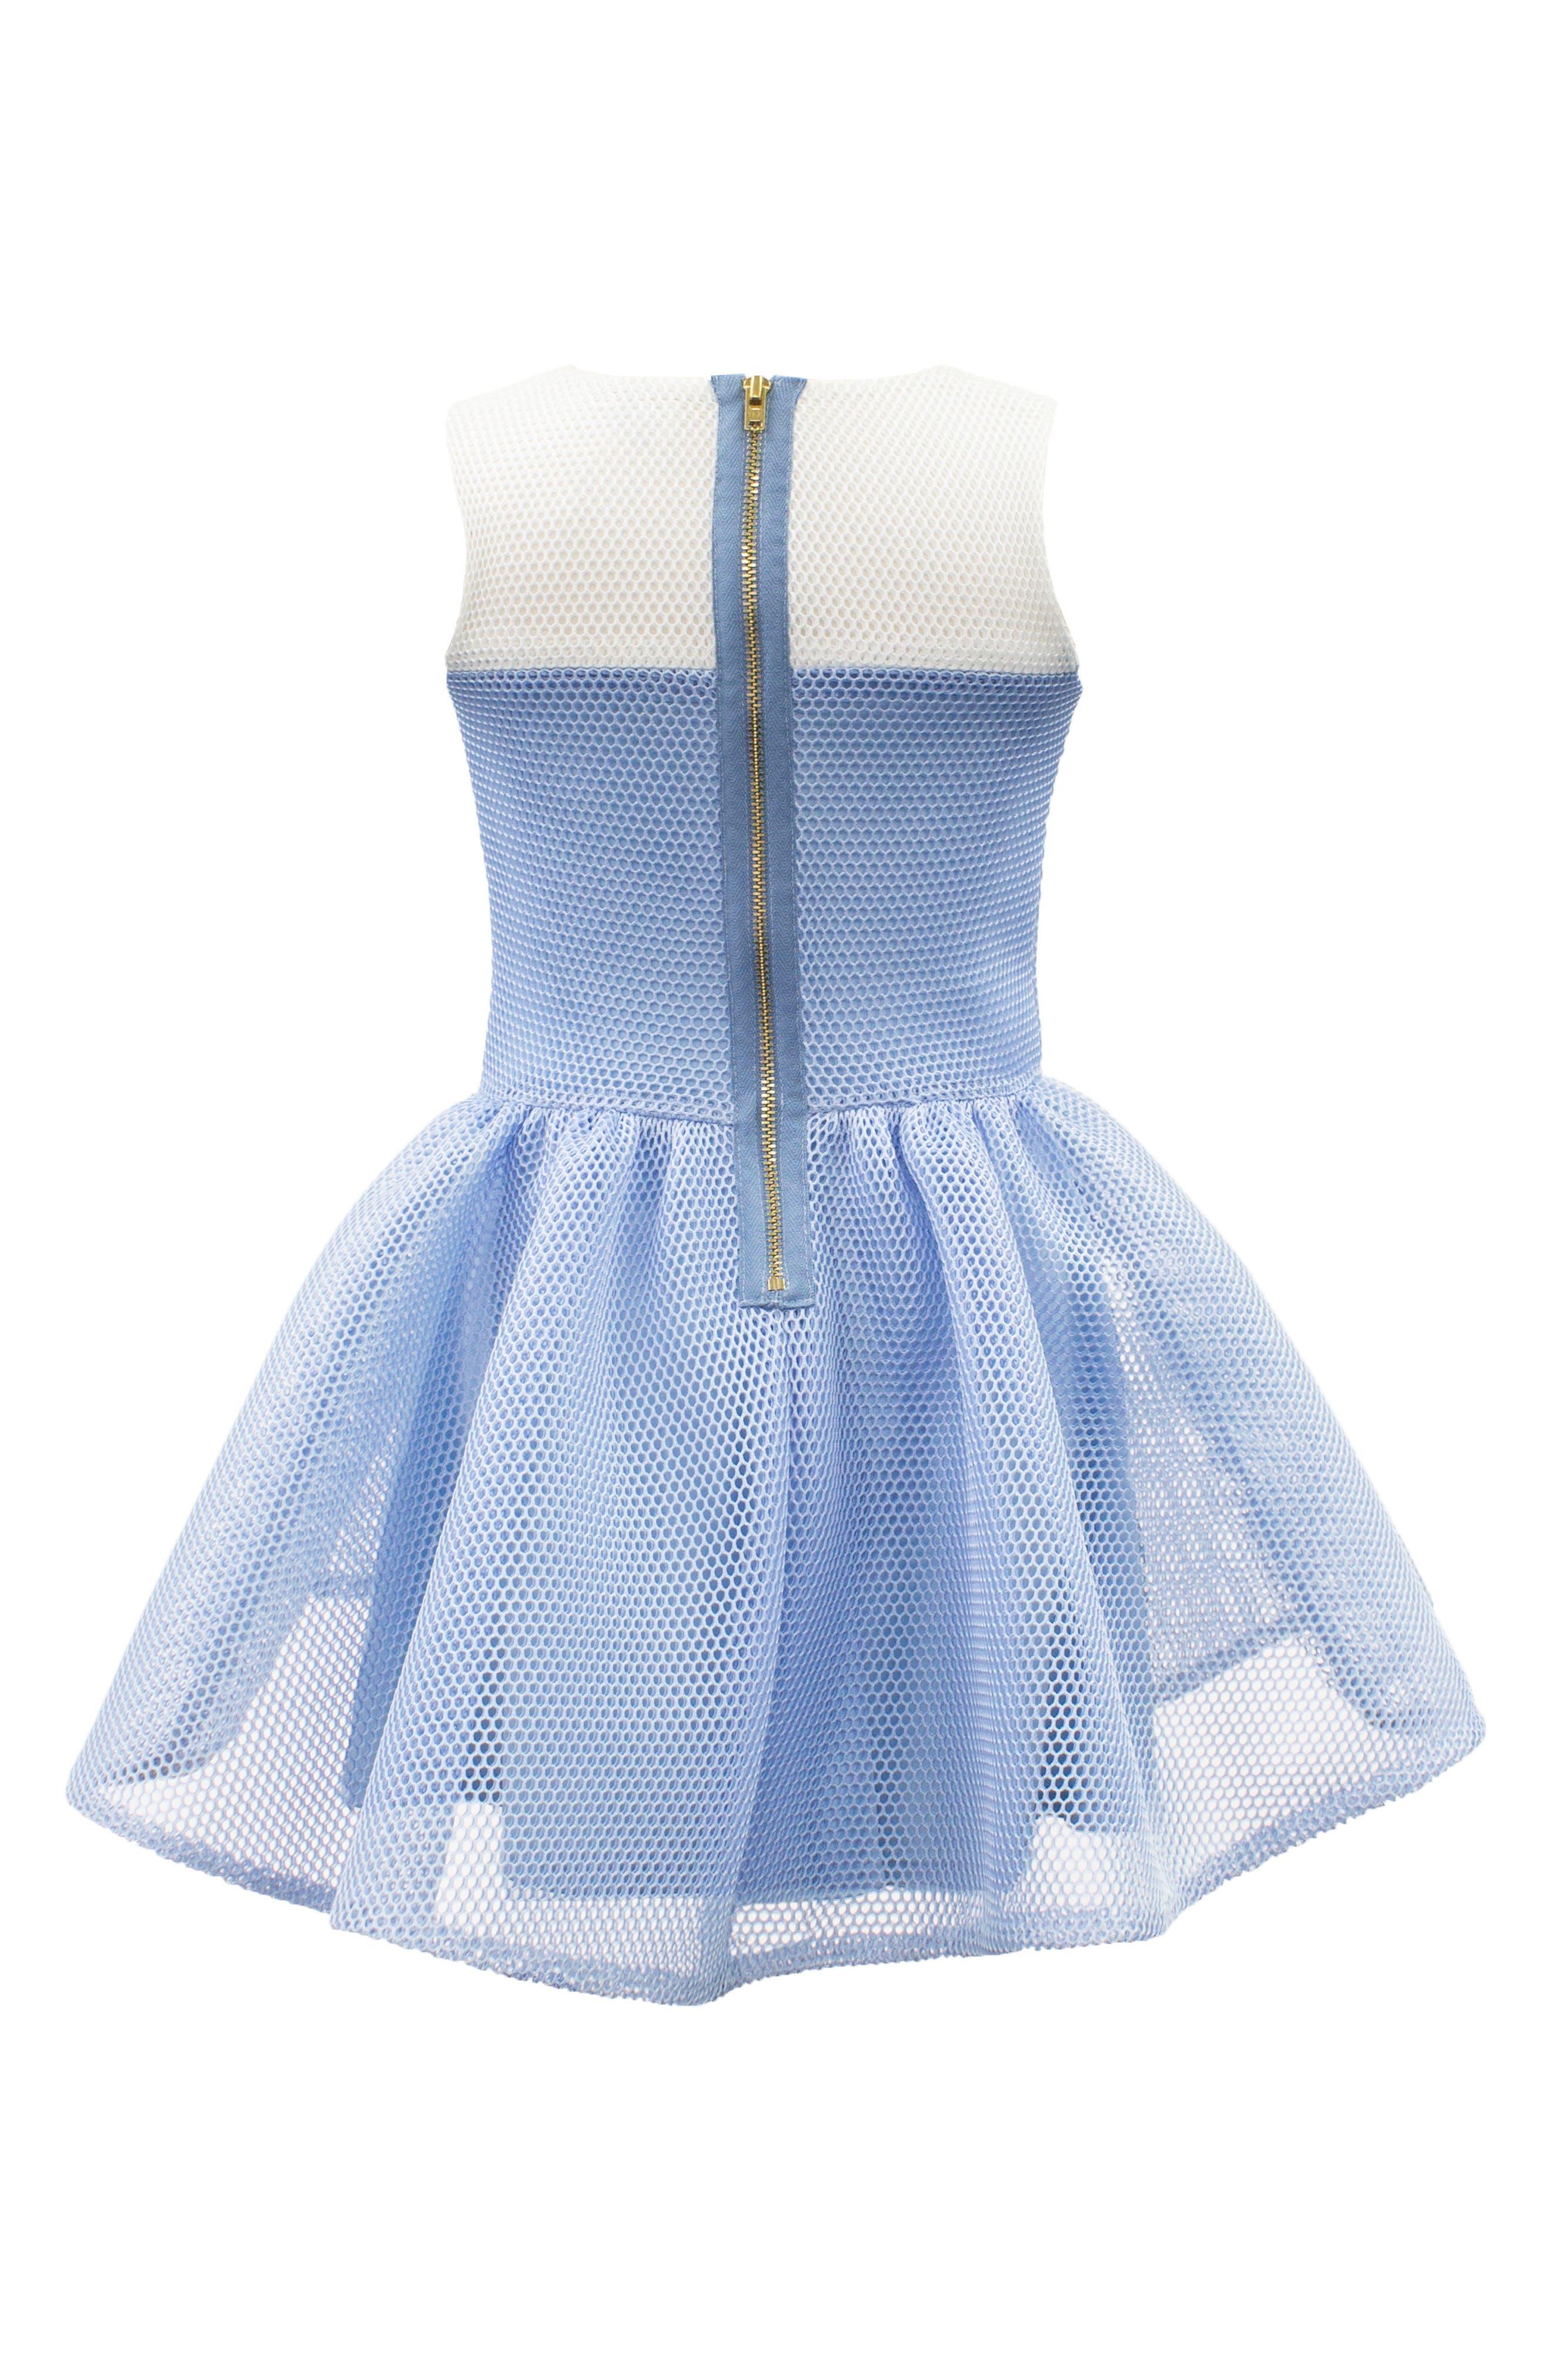 Mesh Fit & Flare Dress,                             Alternate thumbnail 2, color,                             Blue/ Ivory